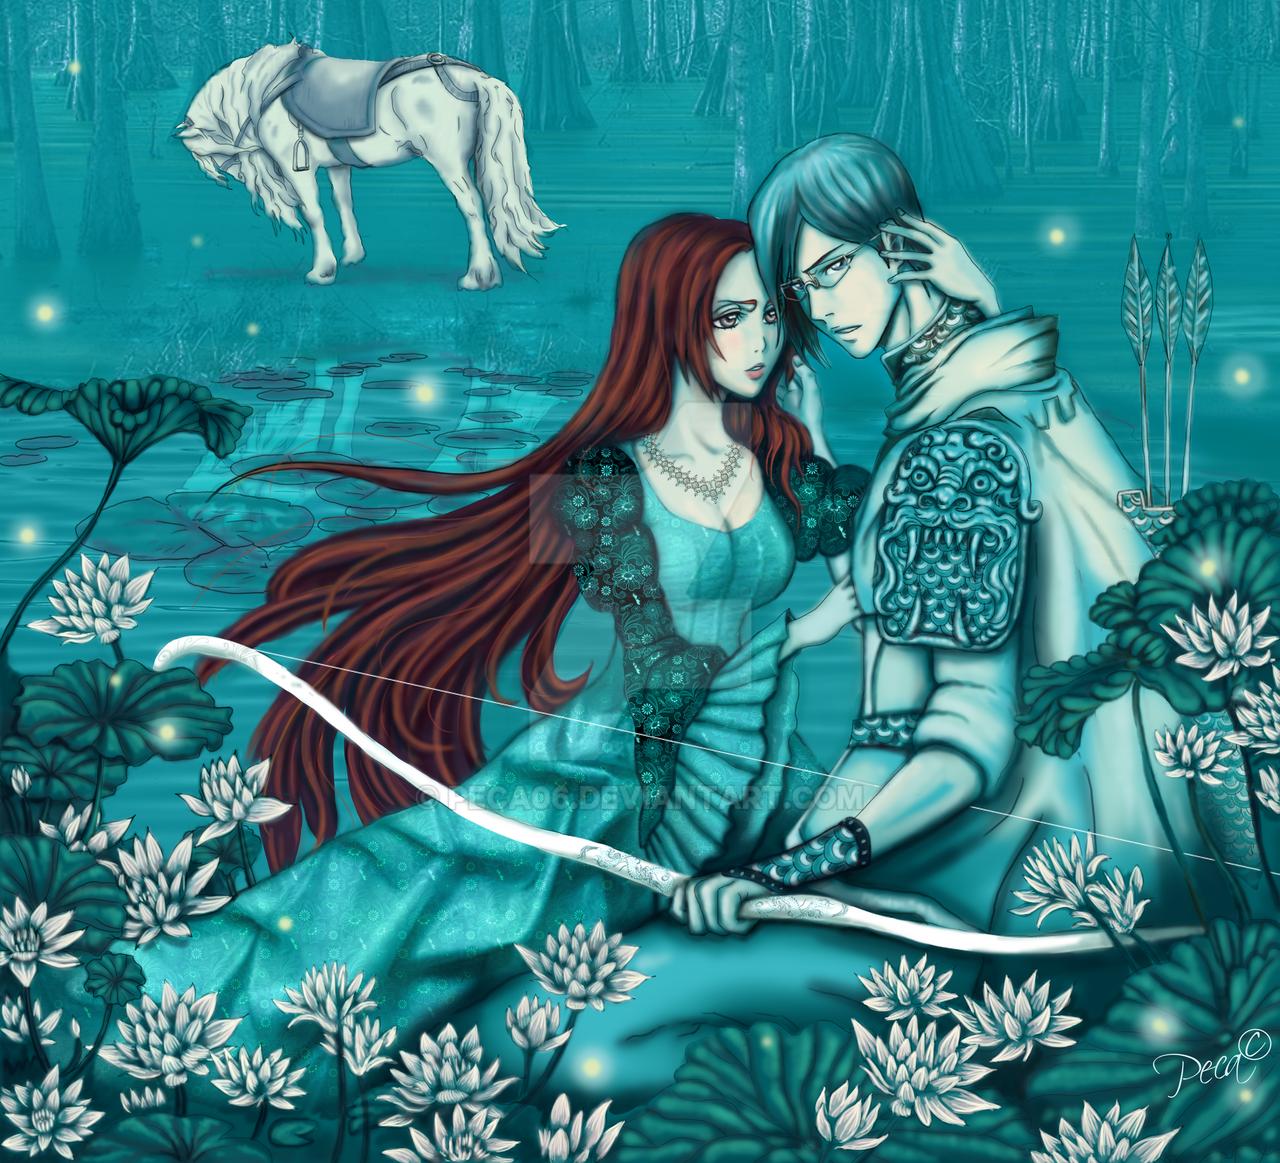 Ishihime fairy tale by peca06